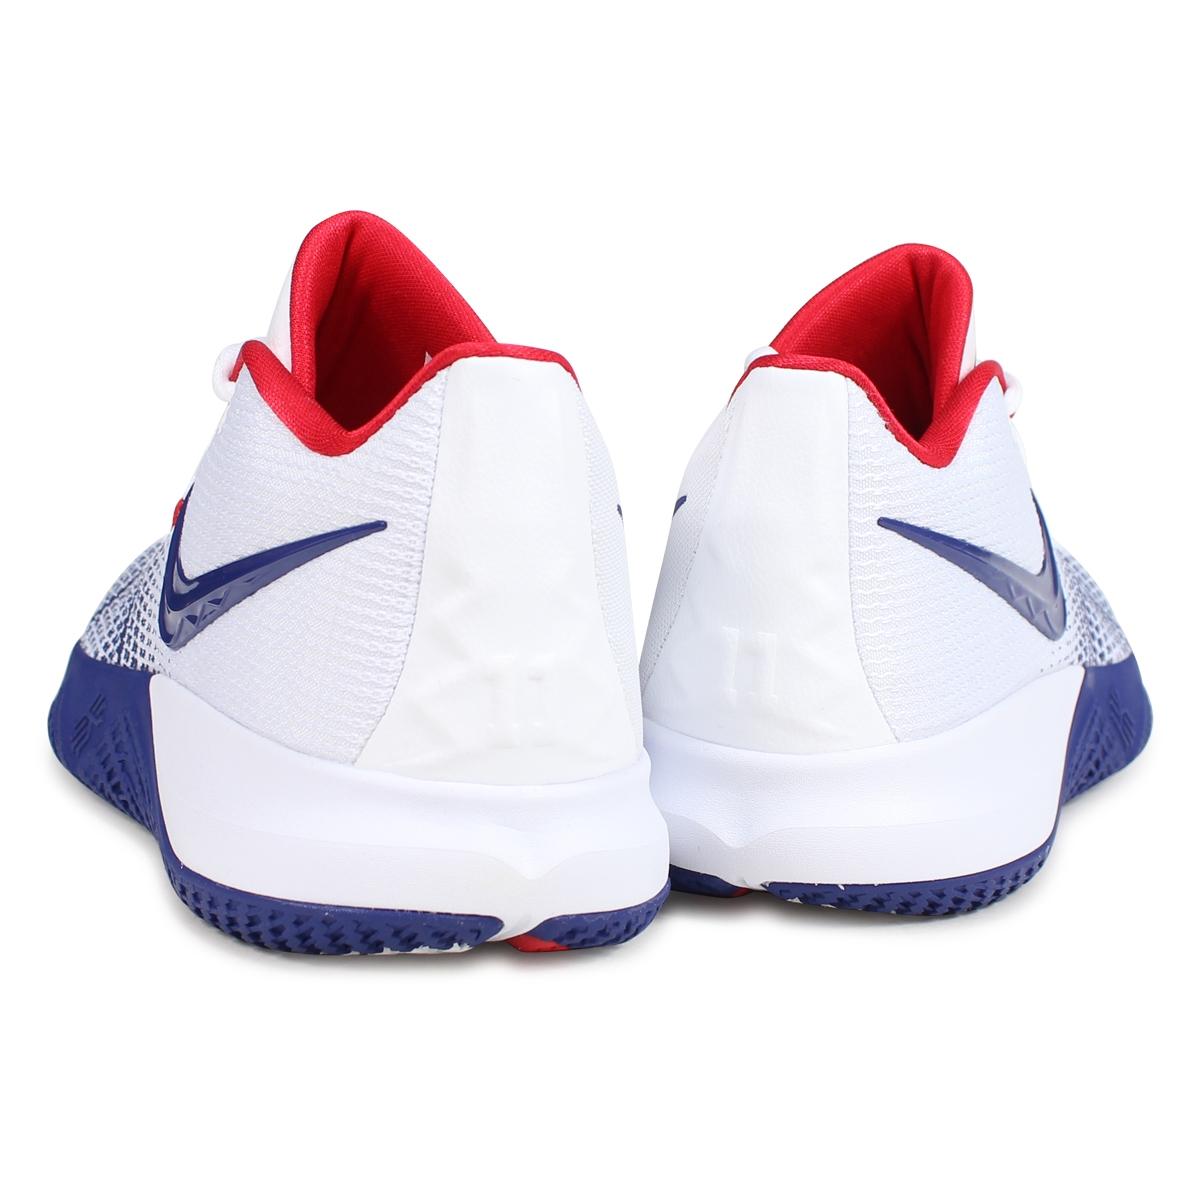 20071689eaed ALLSPORTS  NIKE KYRIE FLYTRAP EP Nike chi Lee sneakers men AJ1935 ...